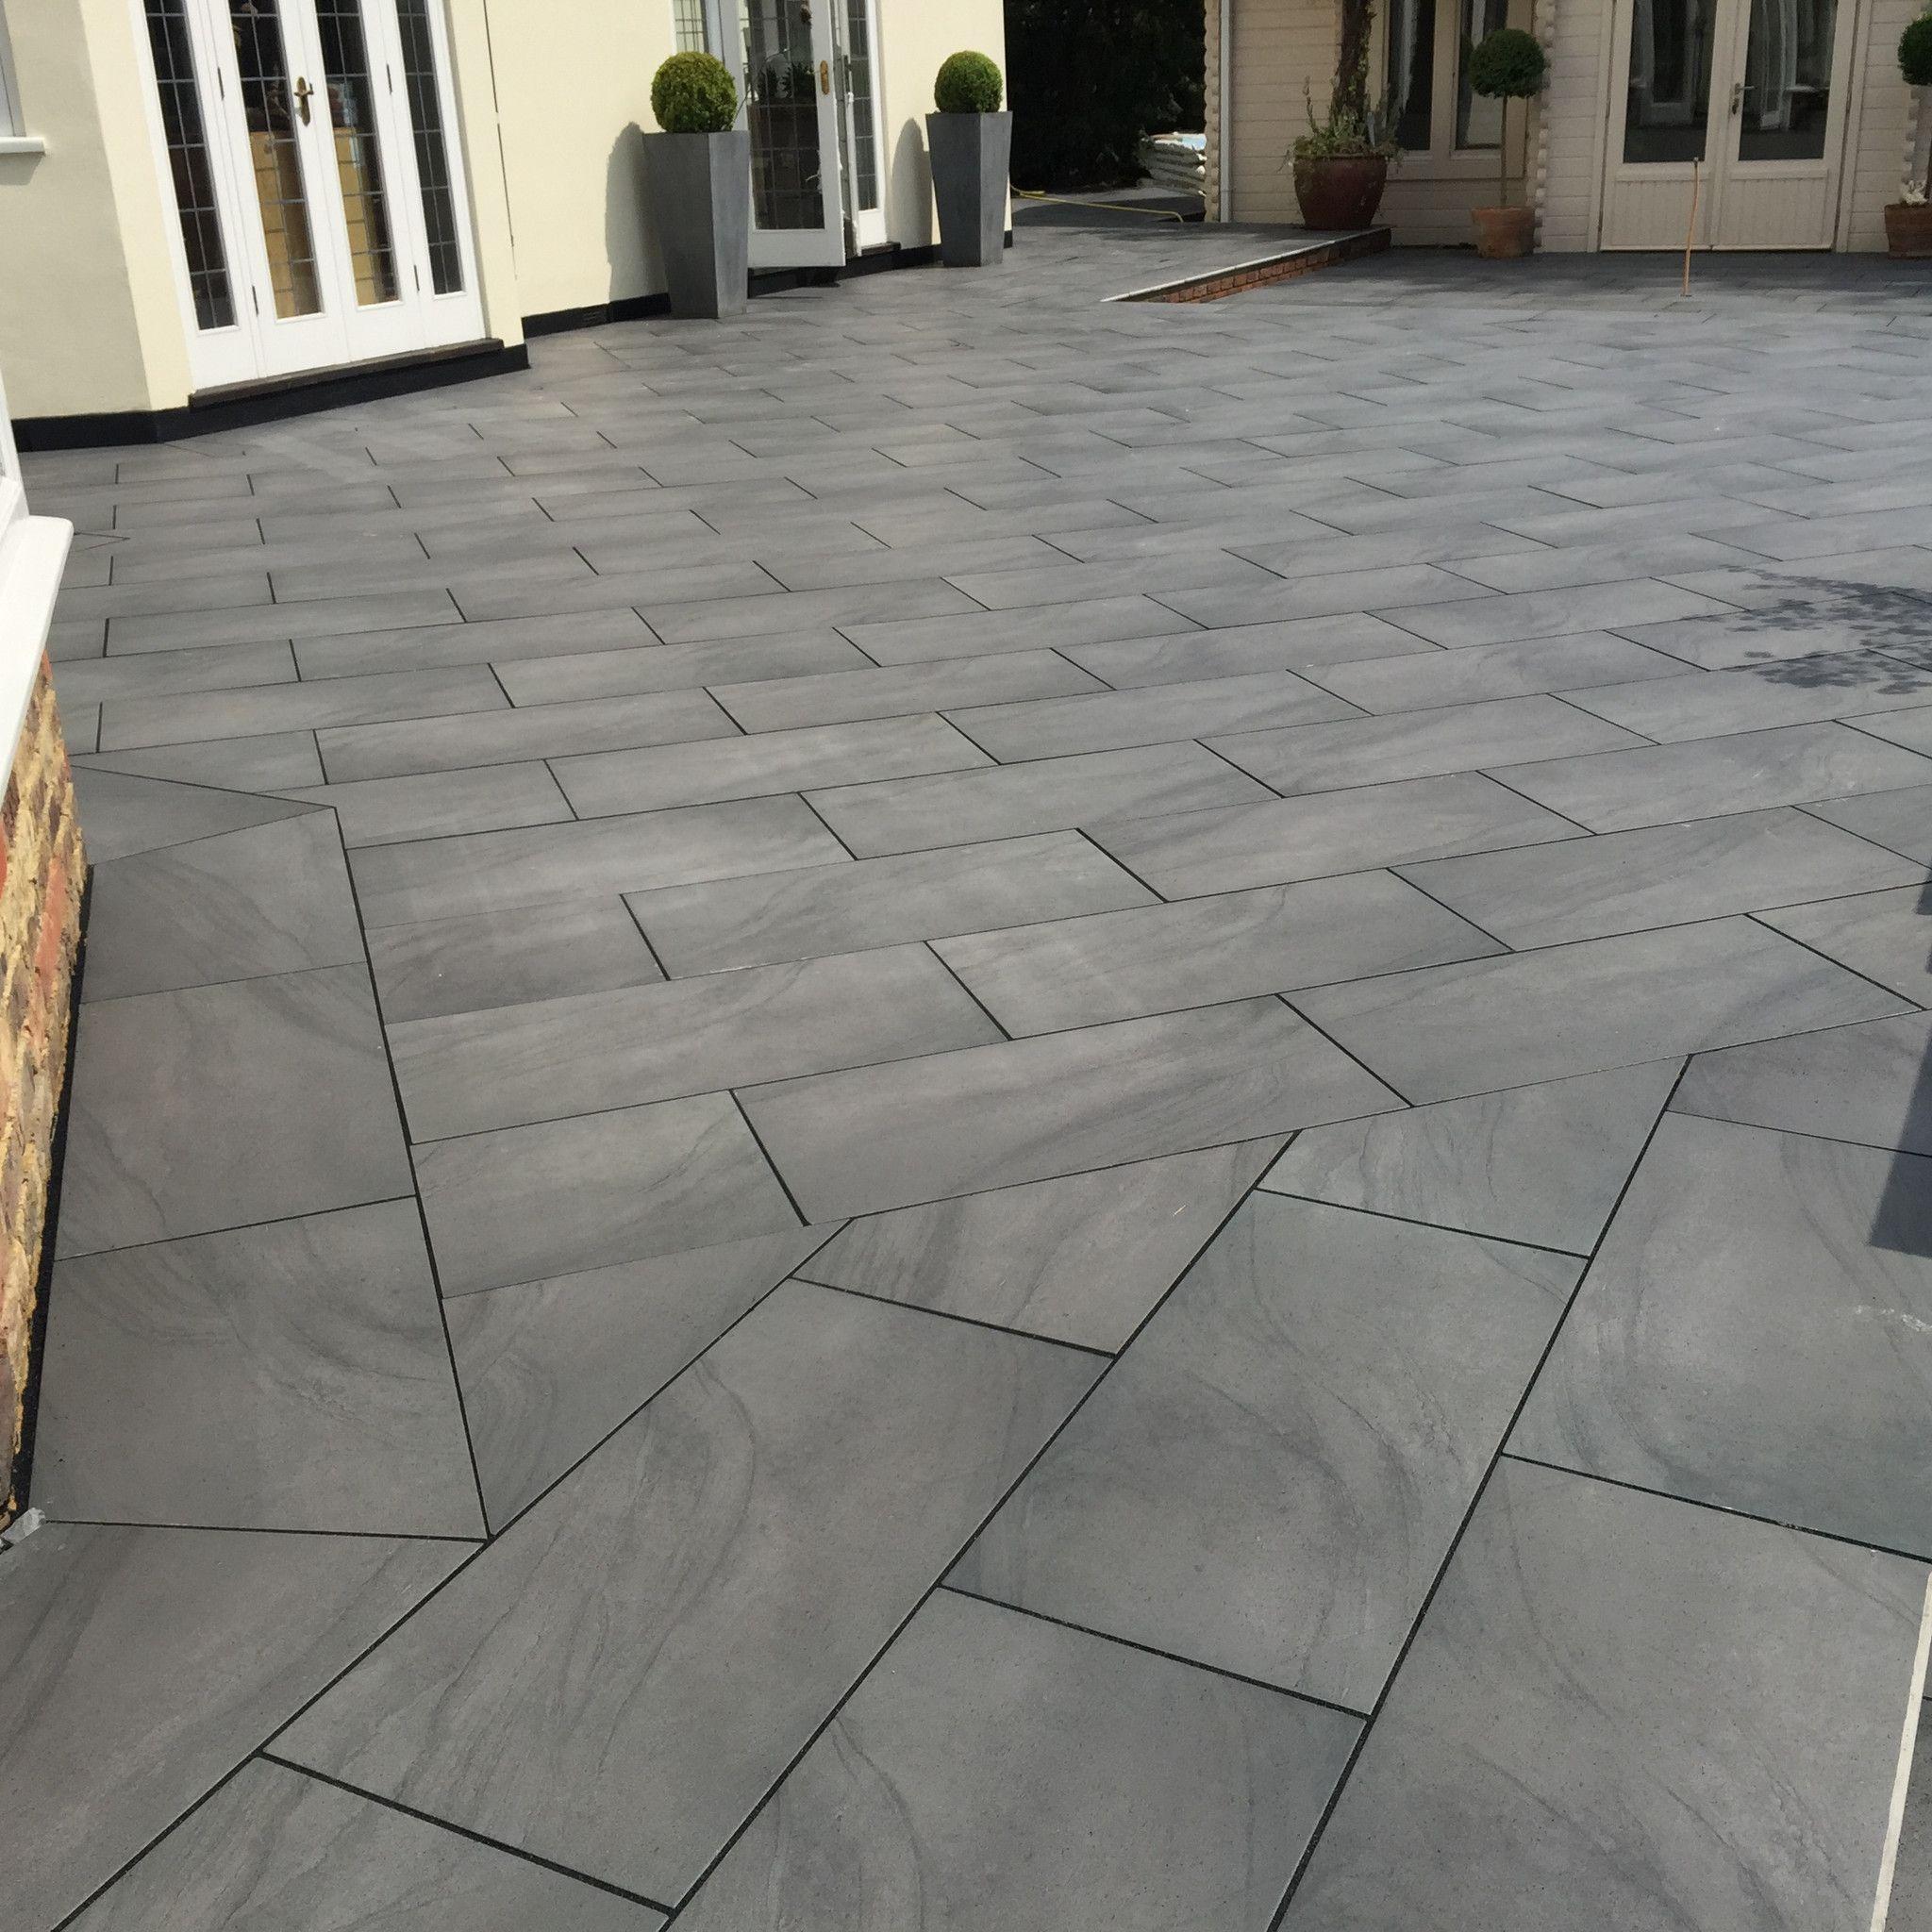 Beautiful External Patio Grey Tiles In Running Bond Pattern